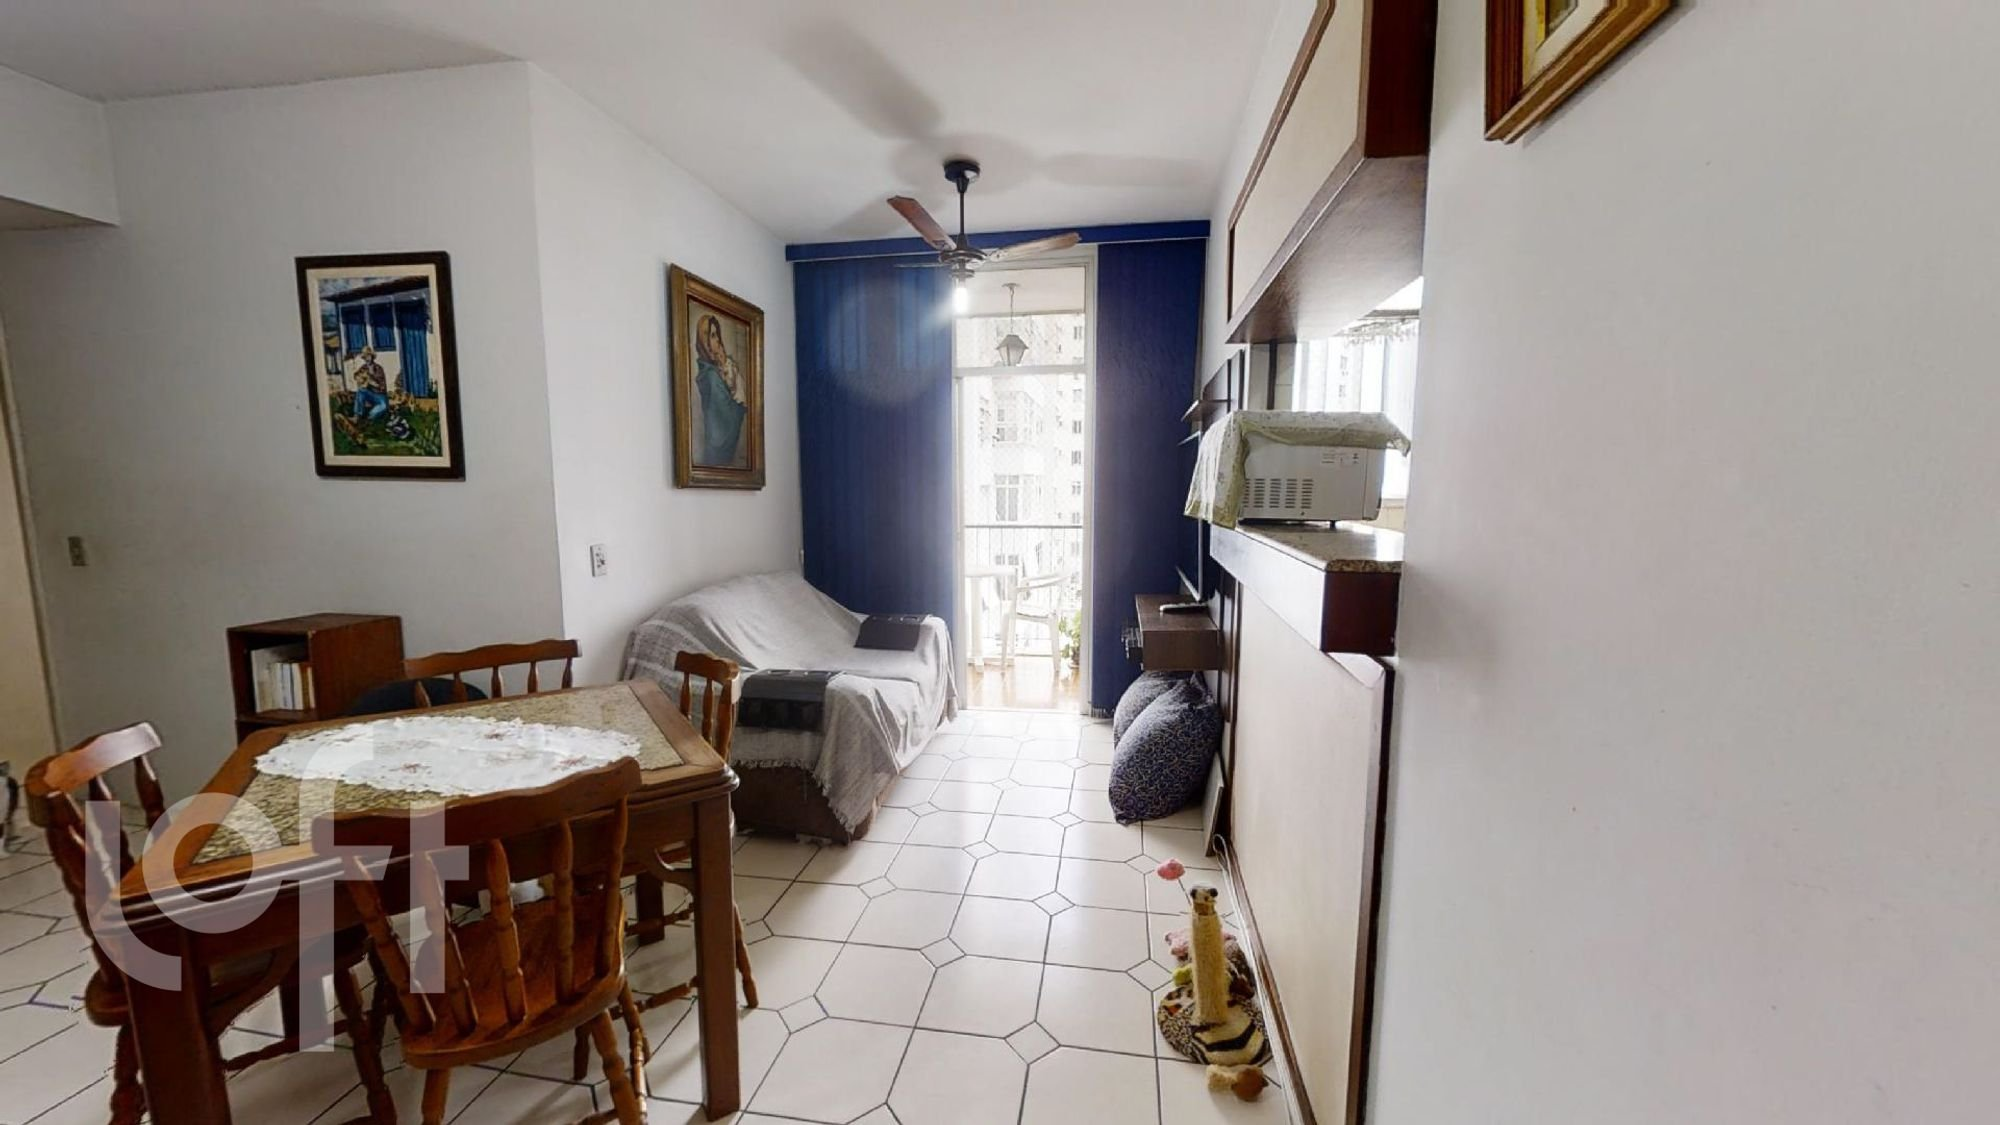 Foto de Sala com cama, cadeira, mesa de jantar